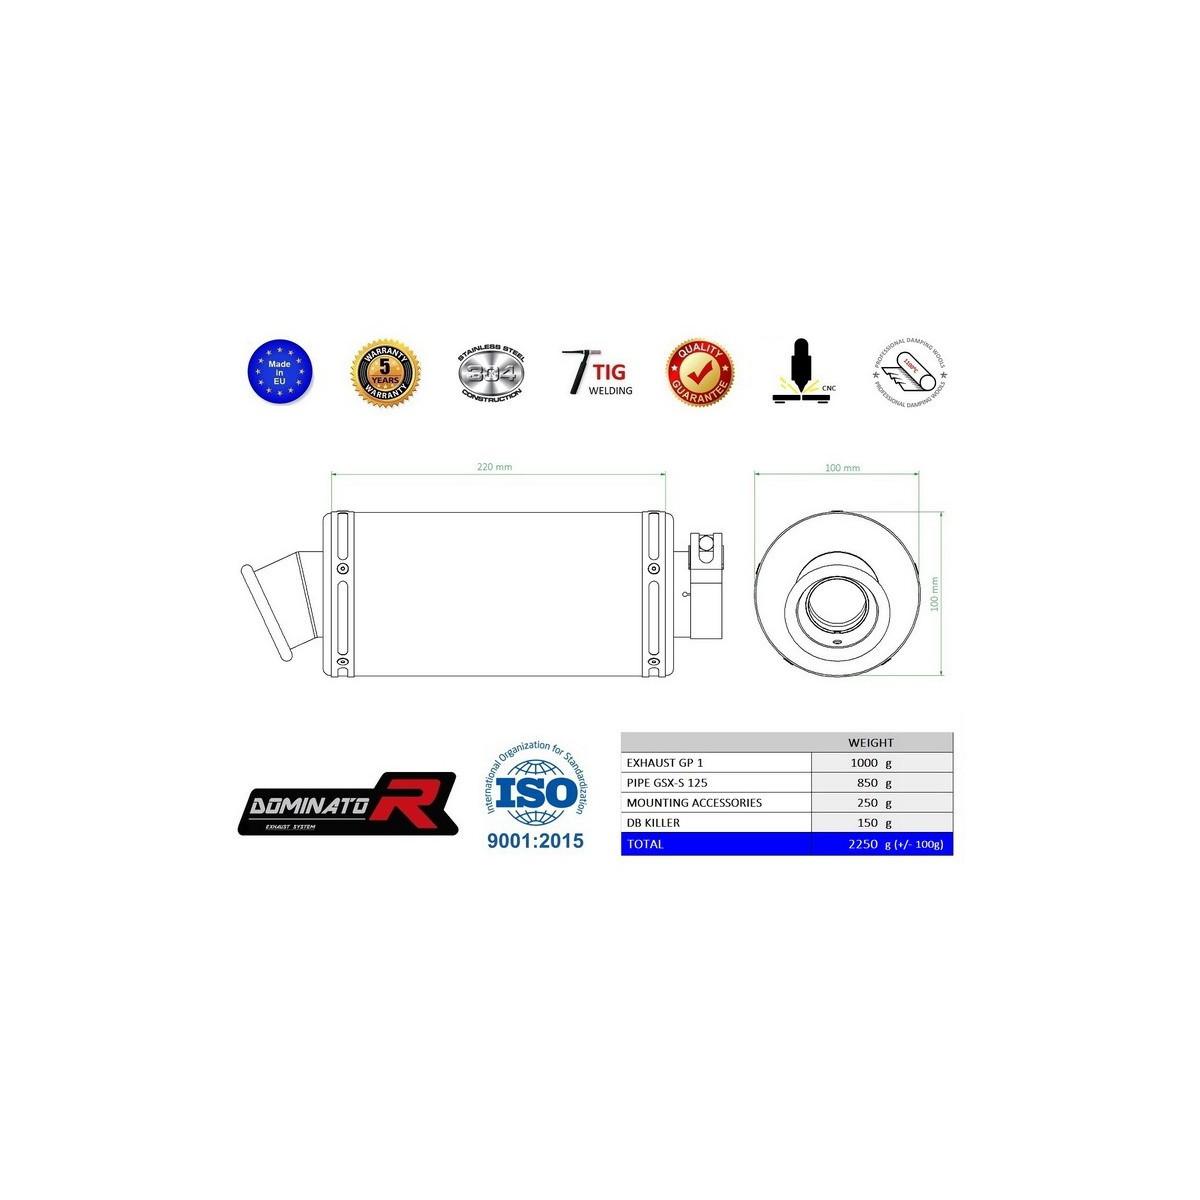 Výfuk SUZUKI GSX-R 125 2017- DOMINATOR full system